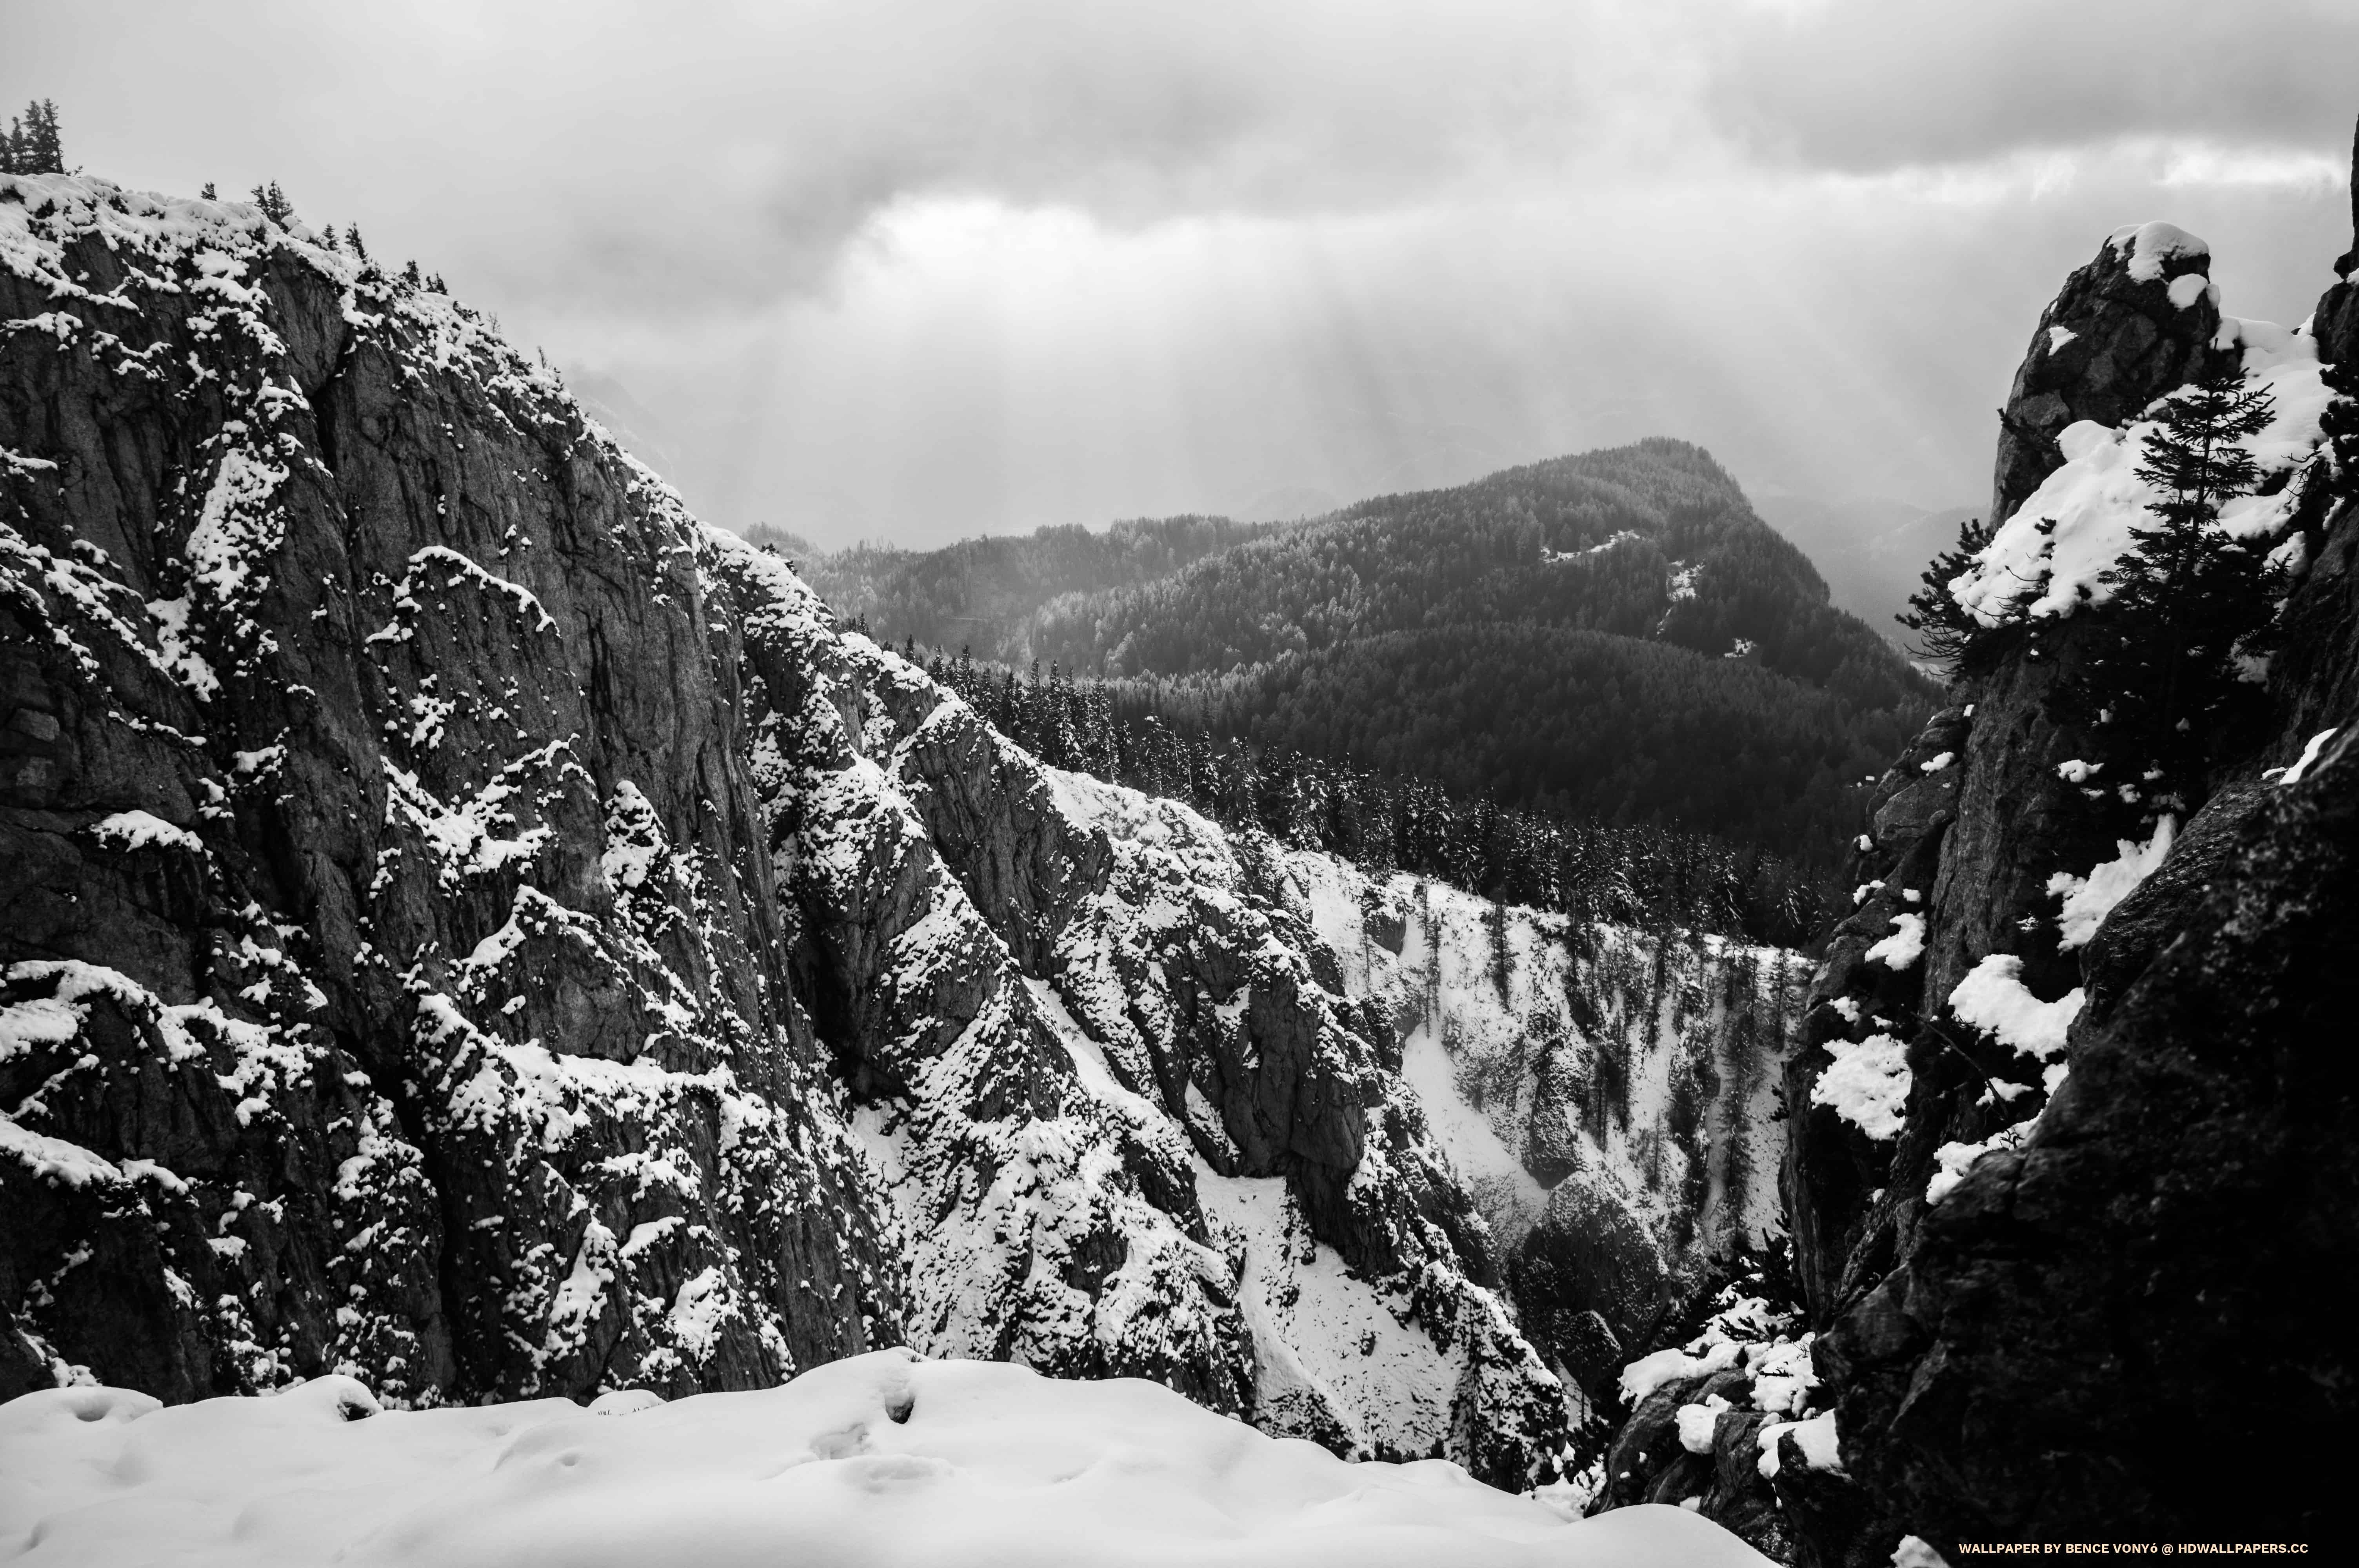 Great Wallpaper Mountain 1440p - rocky-mountain  Snapshot_4590100.jpg?fit\u003d3850%2C2560\u0026ssl\u003d1